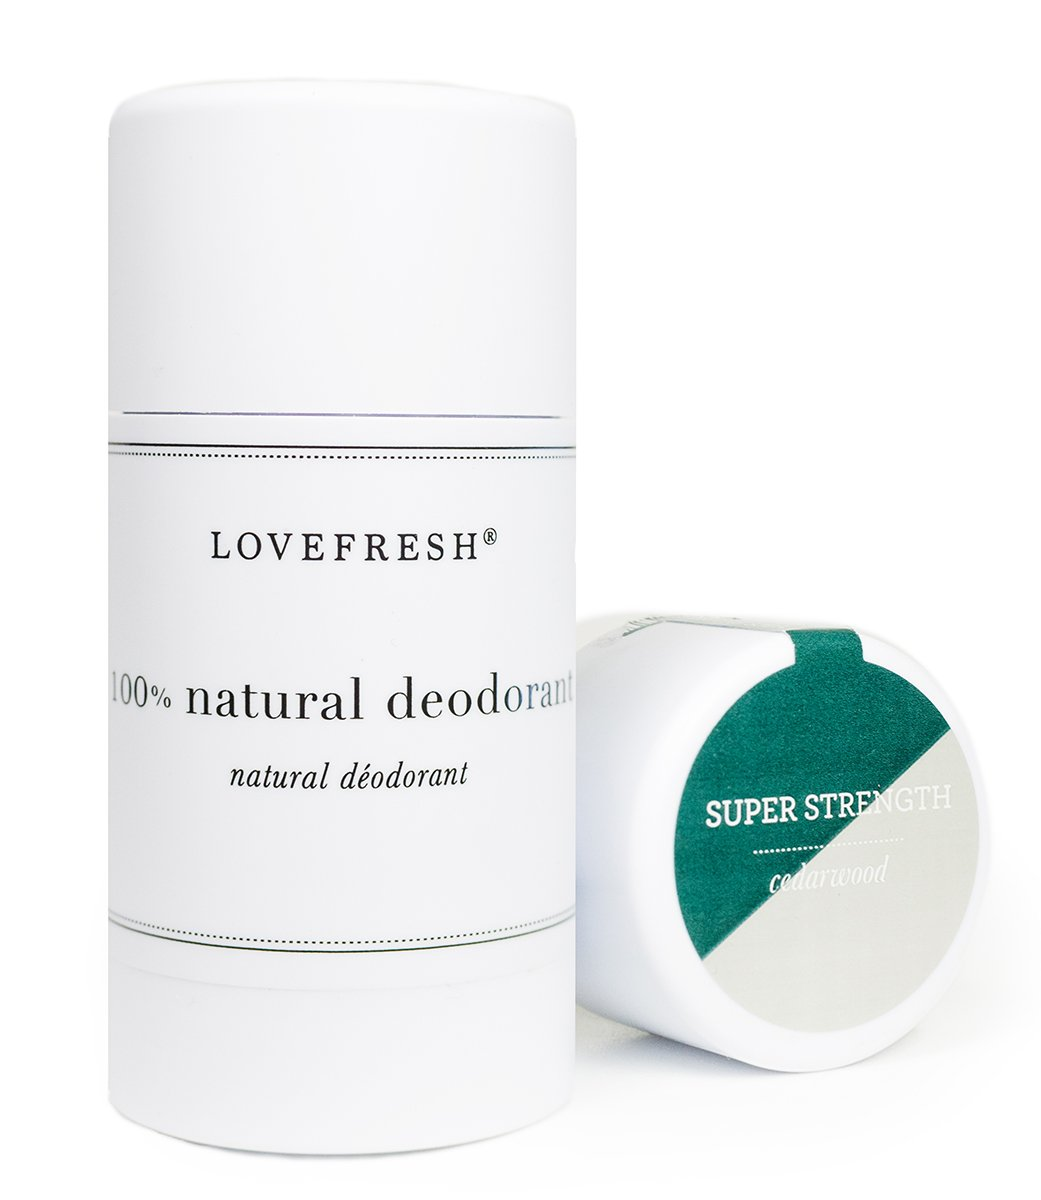 Amazon.com : Lovefresh - Natural Super Strength Deodorant | Aluminum Free  (Cedar & Saffron) (3.7 oz) : Beauty & Personal Care